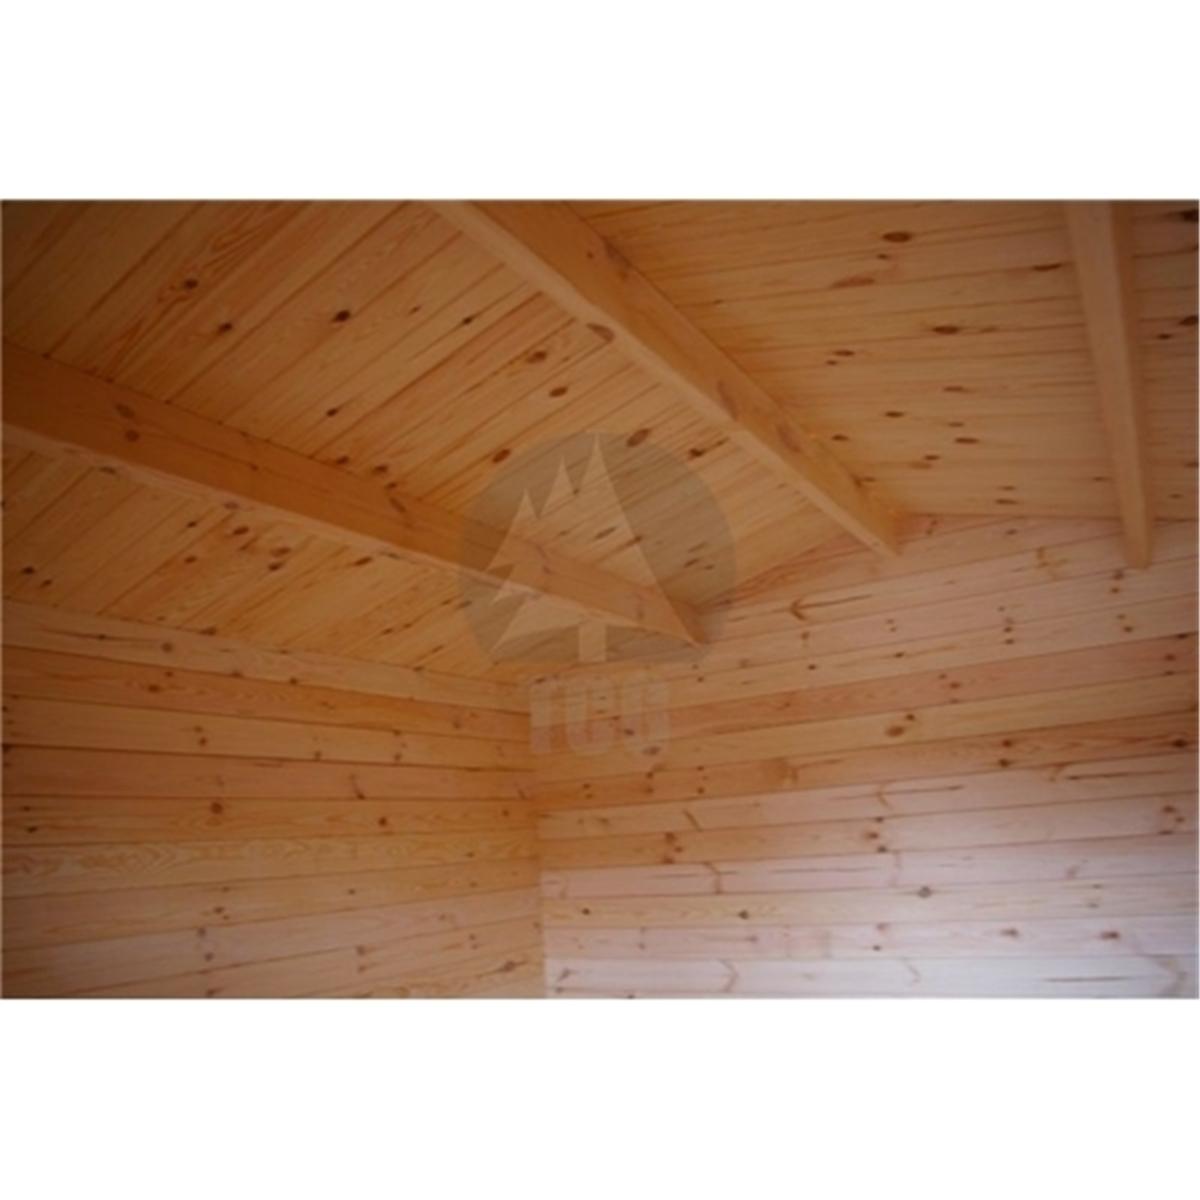 3m X 3m (10 X 10) Corner Log Cabin (2036)